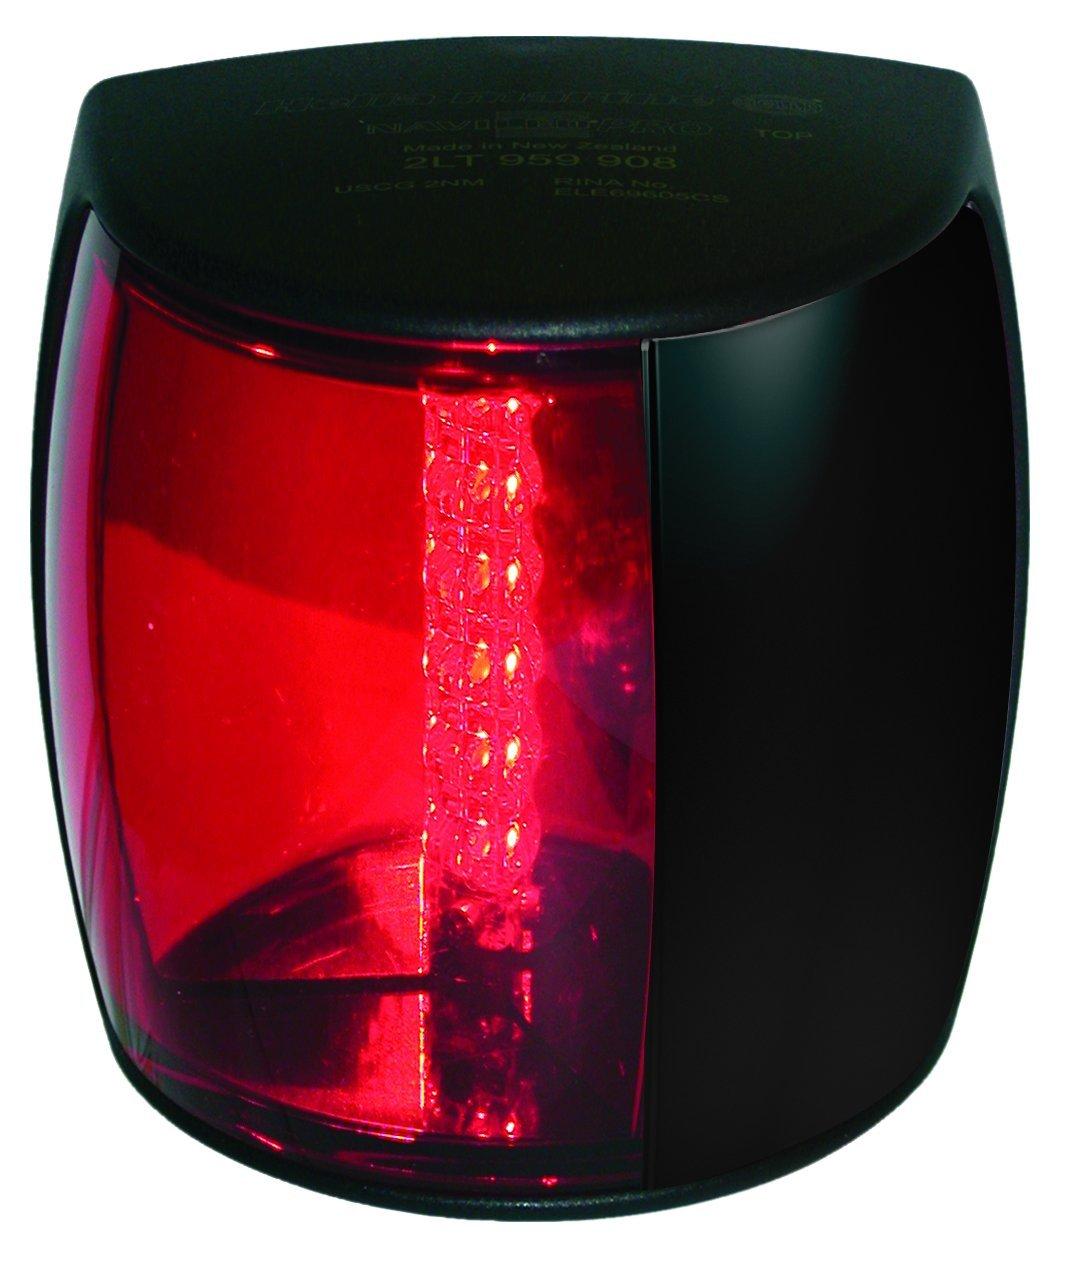 HELLA 959900201 '9900 Series' NaviLED PRO Multivolt 9-33V DC 3 NM LED Port Light with Colored Outer Lens and Black Shroud